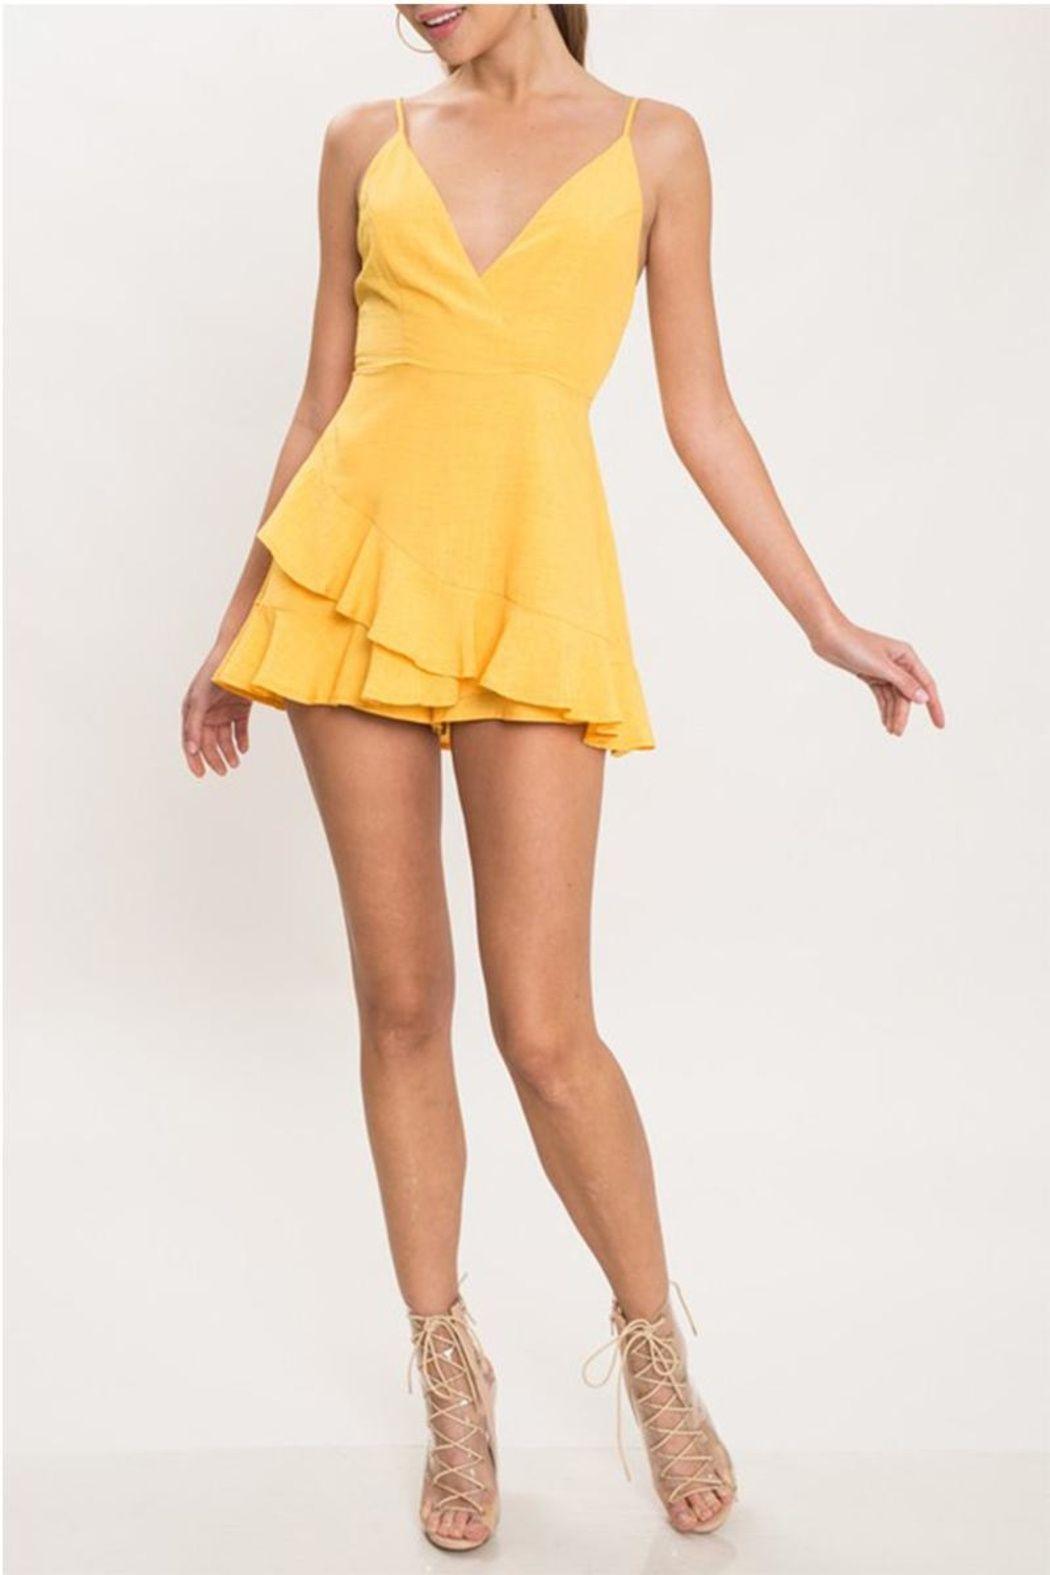 d3ce3747f64c L atiste Yellow Shift Dress - Main Image